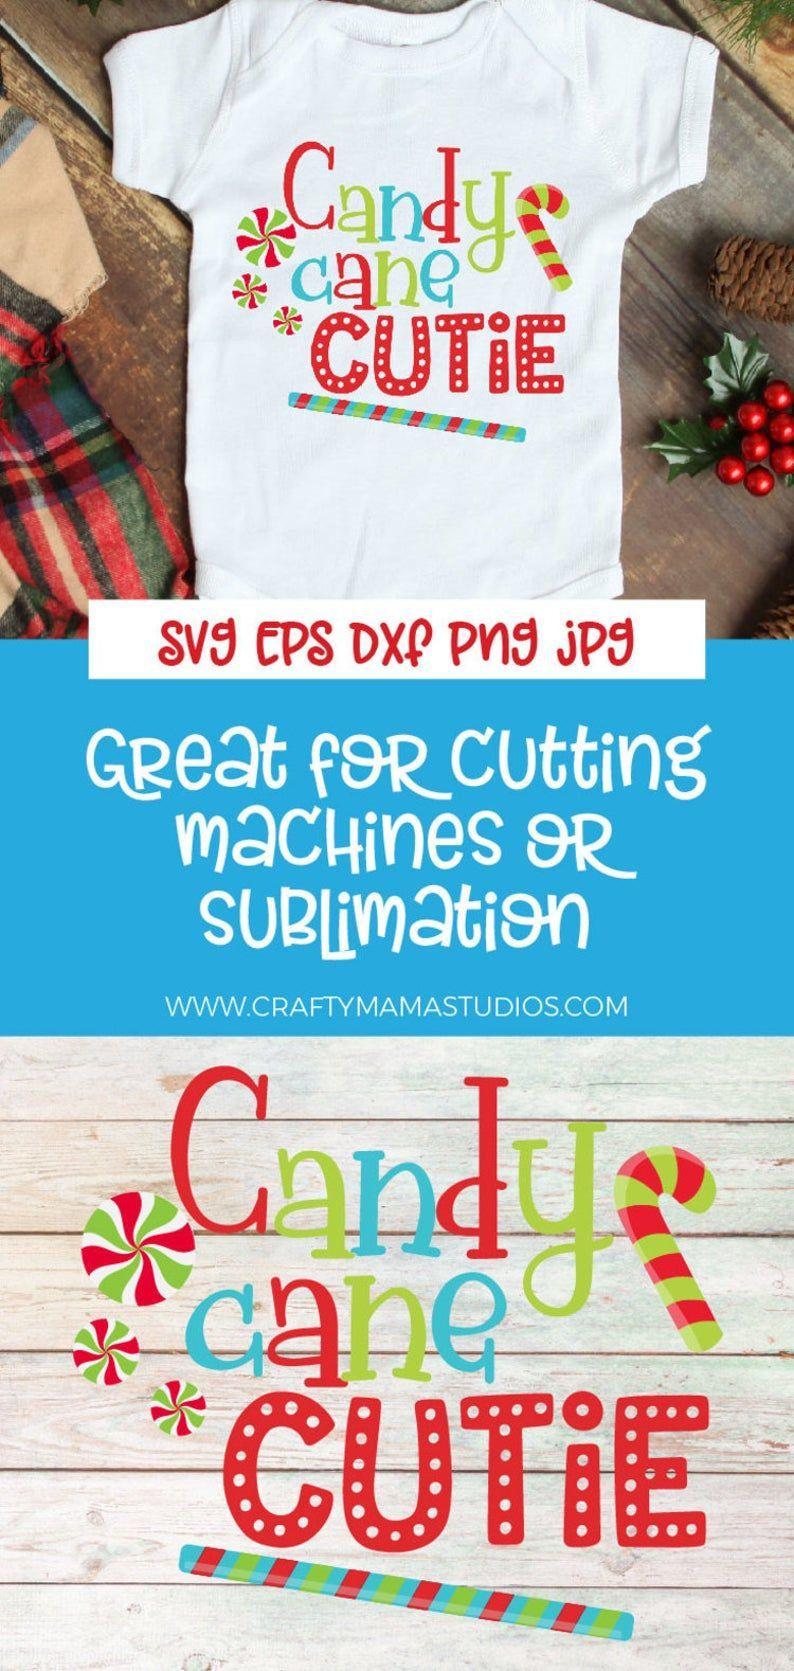 Christmas SVG, Candy Cane Cutie SVG, Candy Cane Christmas